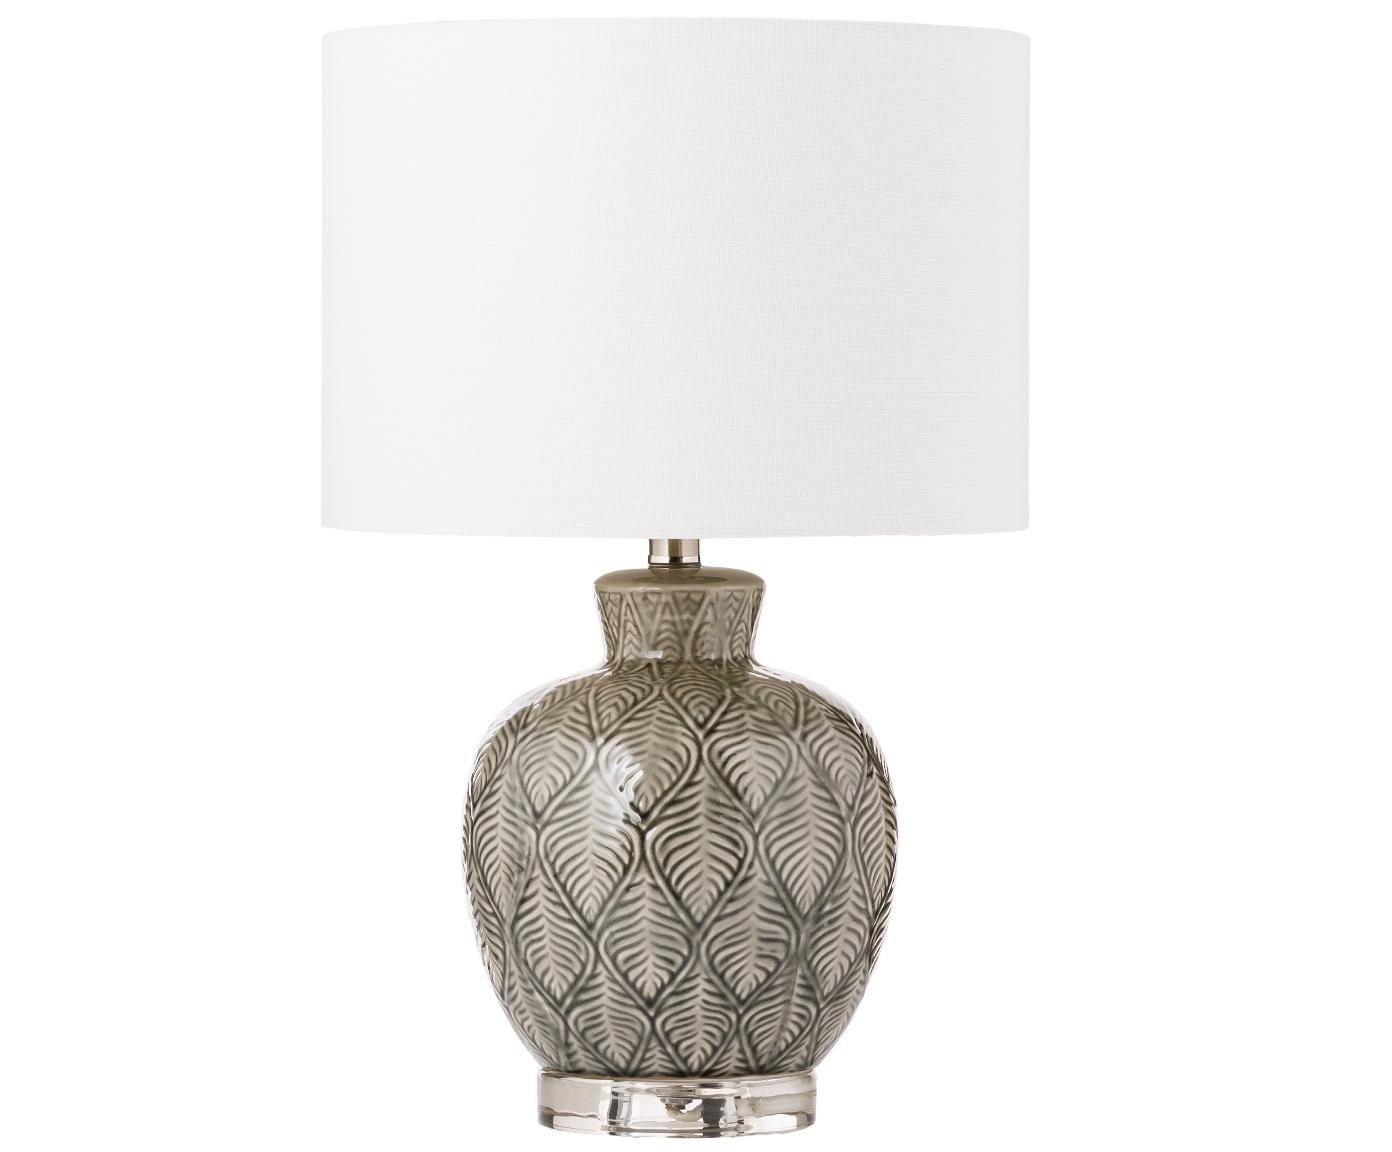 Lampada da tavolo Brooklyn, Base della lampada: ceramica, Paralume: tessuto, Base: trasparente Base della lampada: grigio Paralume crema Cavo: trasparente, Ø 33 x Alt. 53 cm